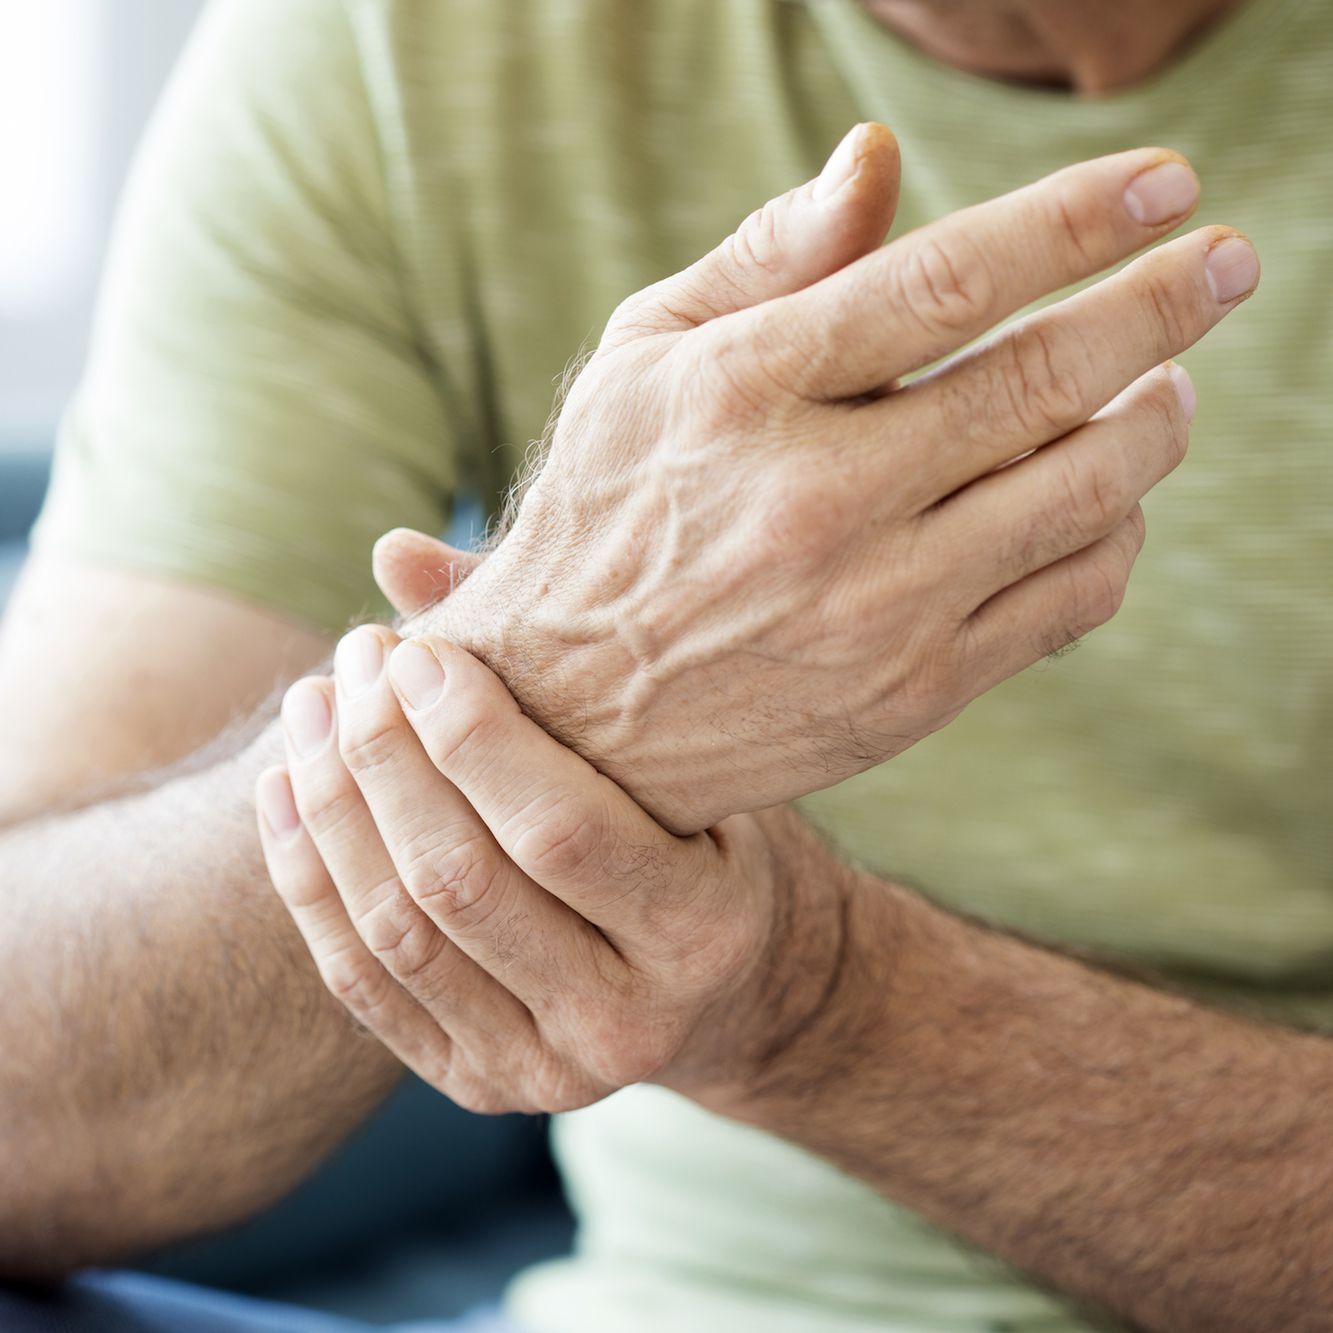 Hook of Hamate Wrist Fracture Symptoms